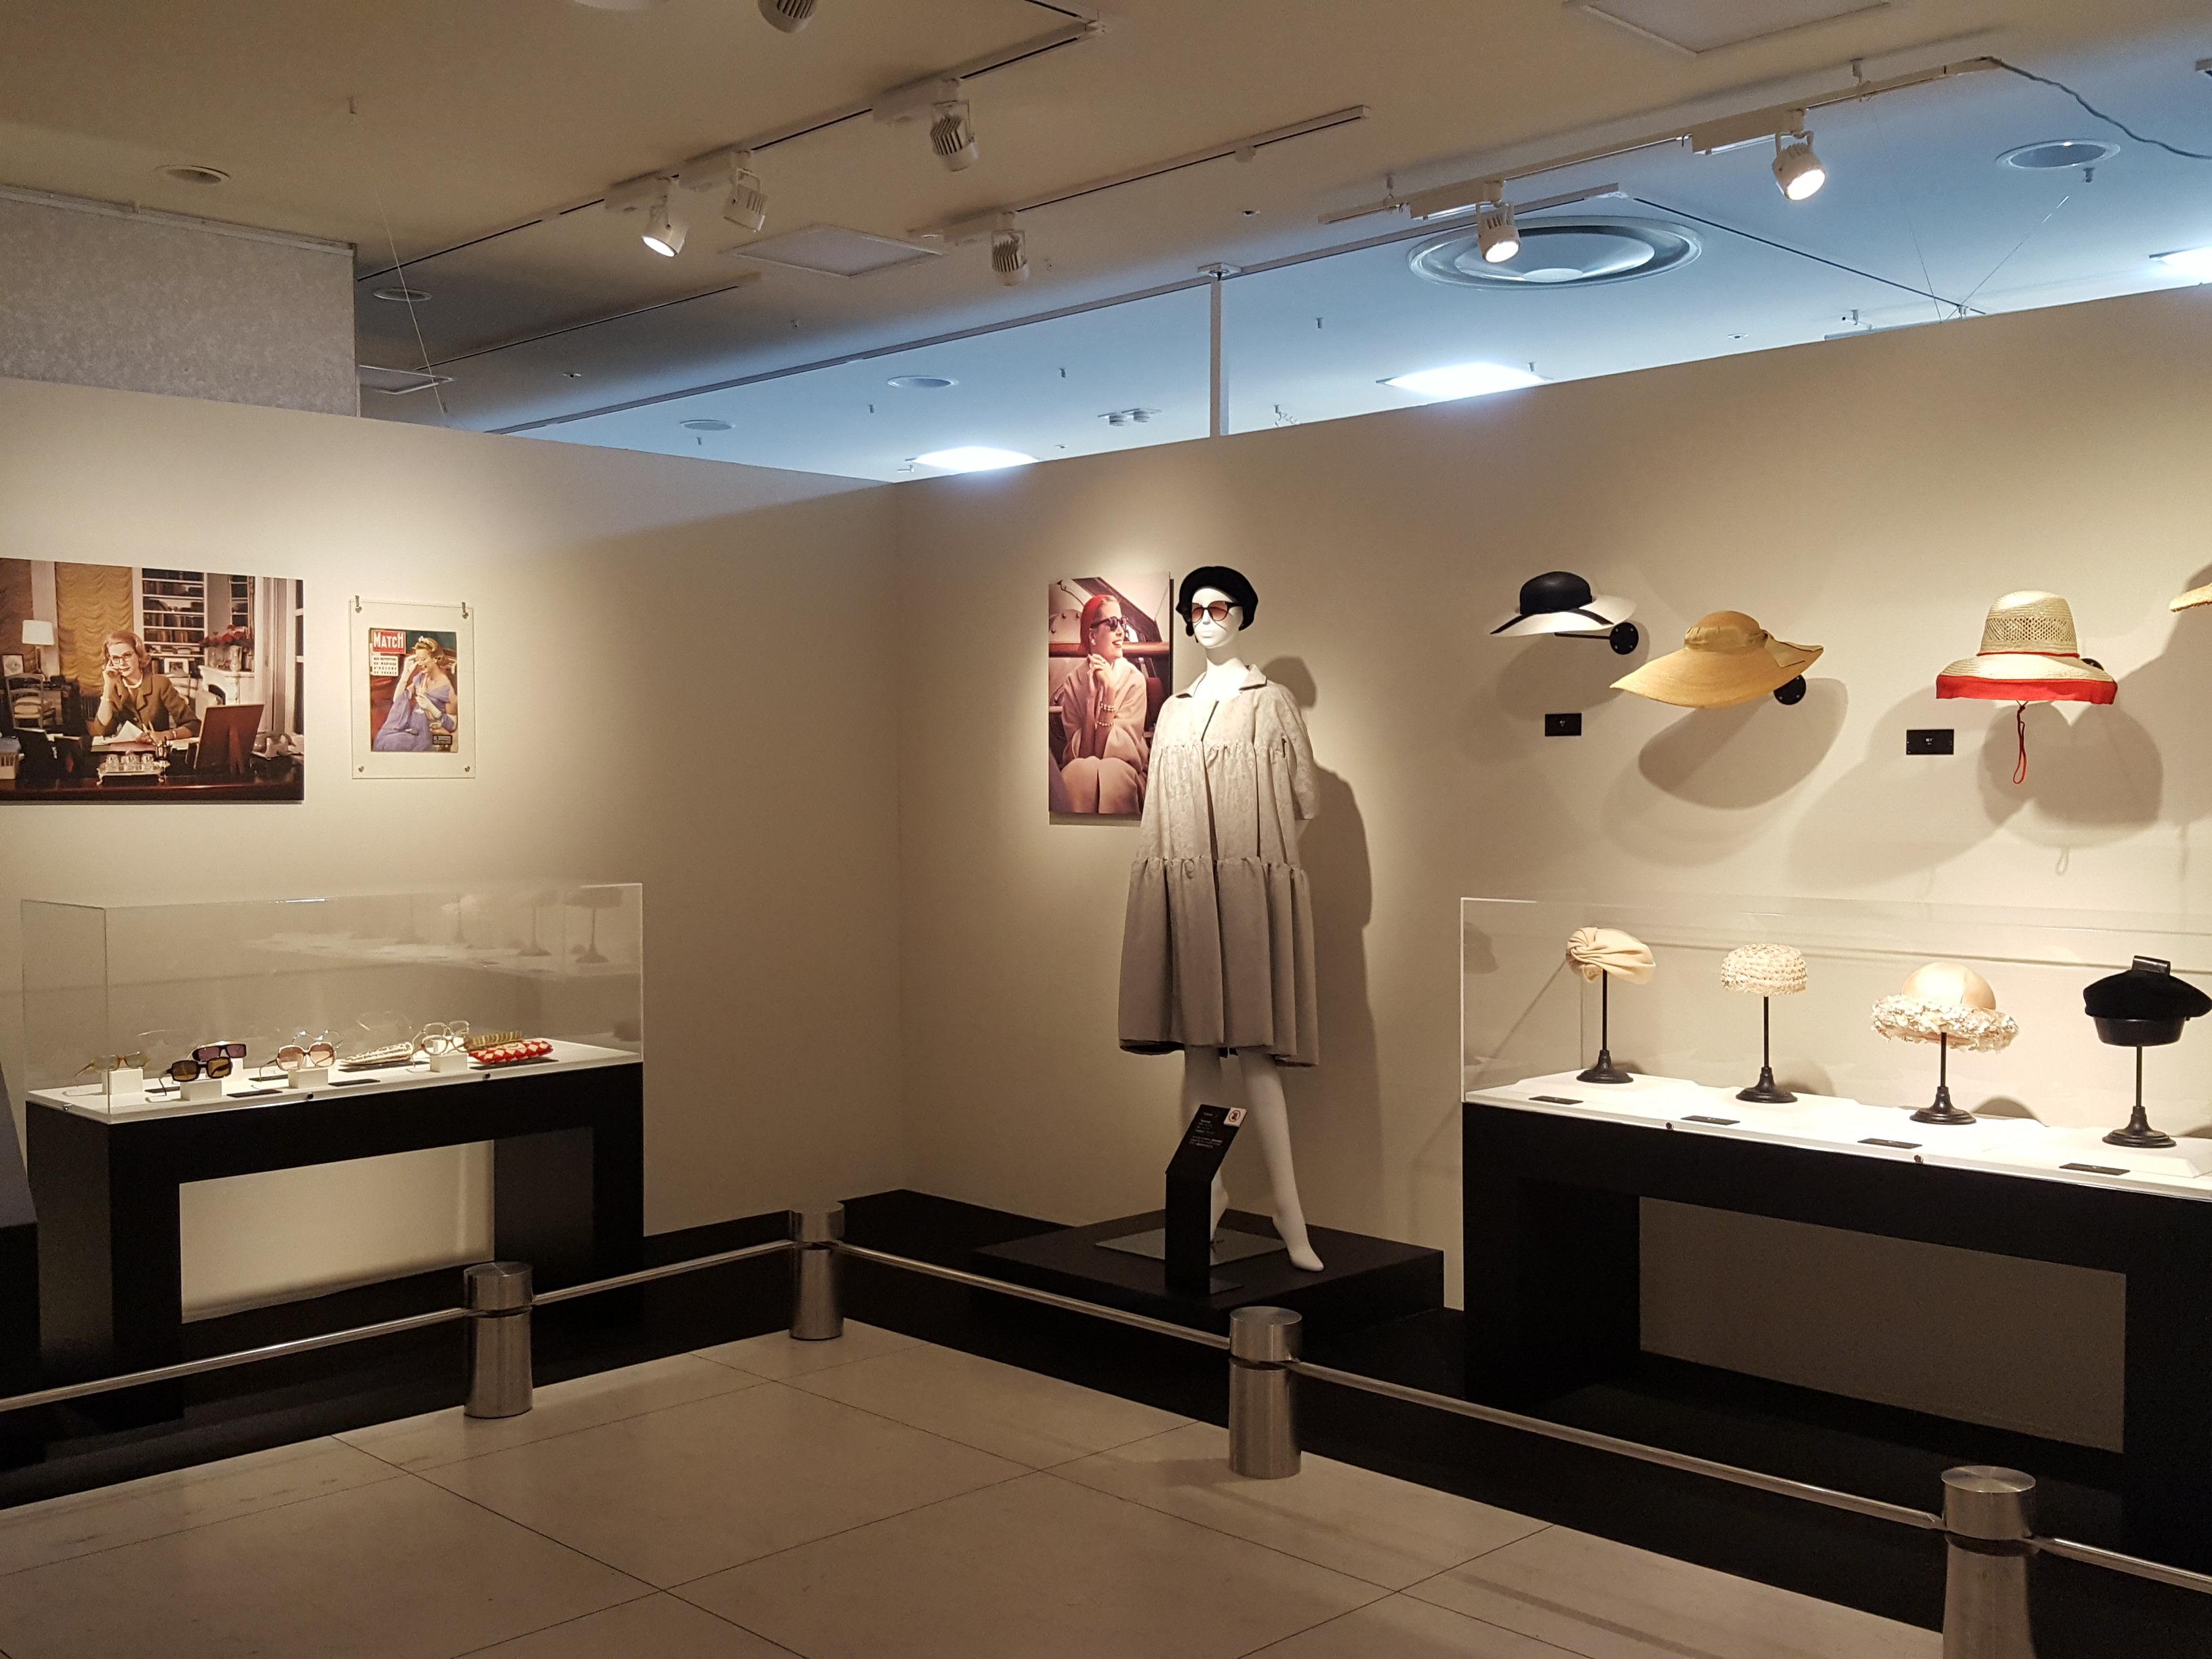 356a9486d4a18 ジェイアール名古屋タカシマヤで『グレース・ケリー展』が開幕!日本初 ...